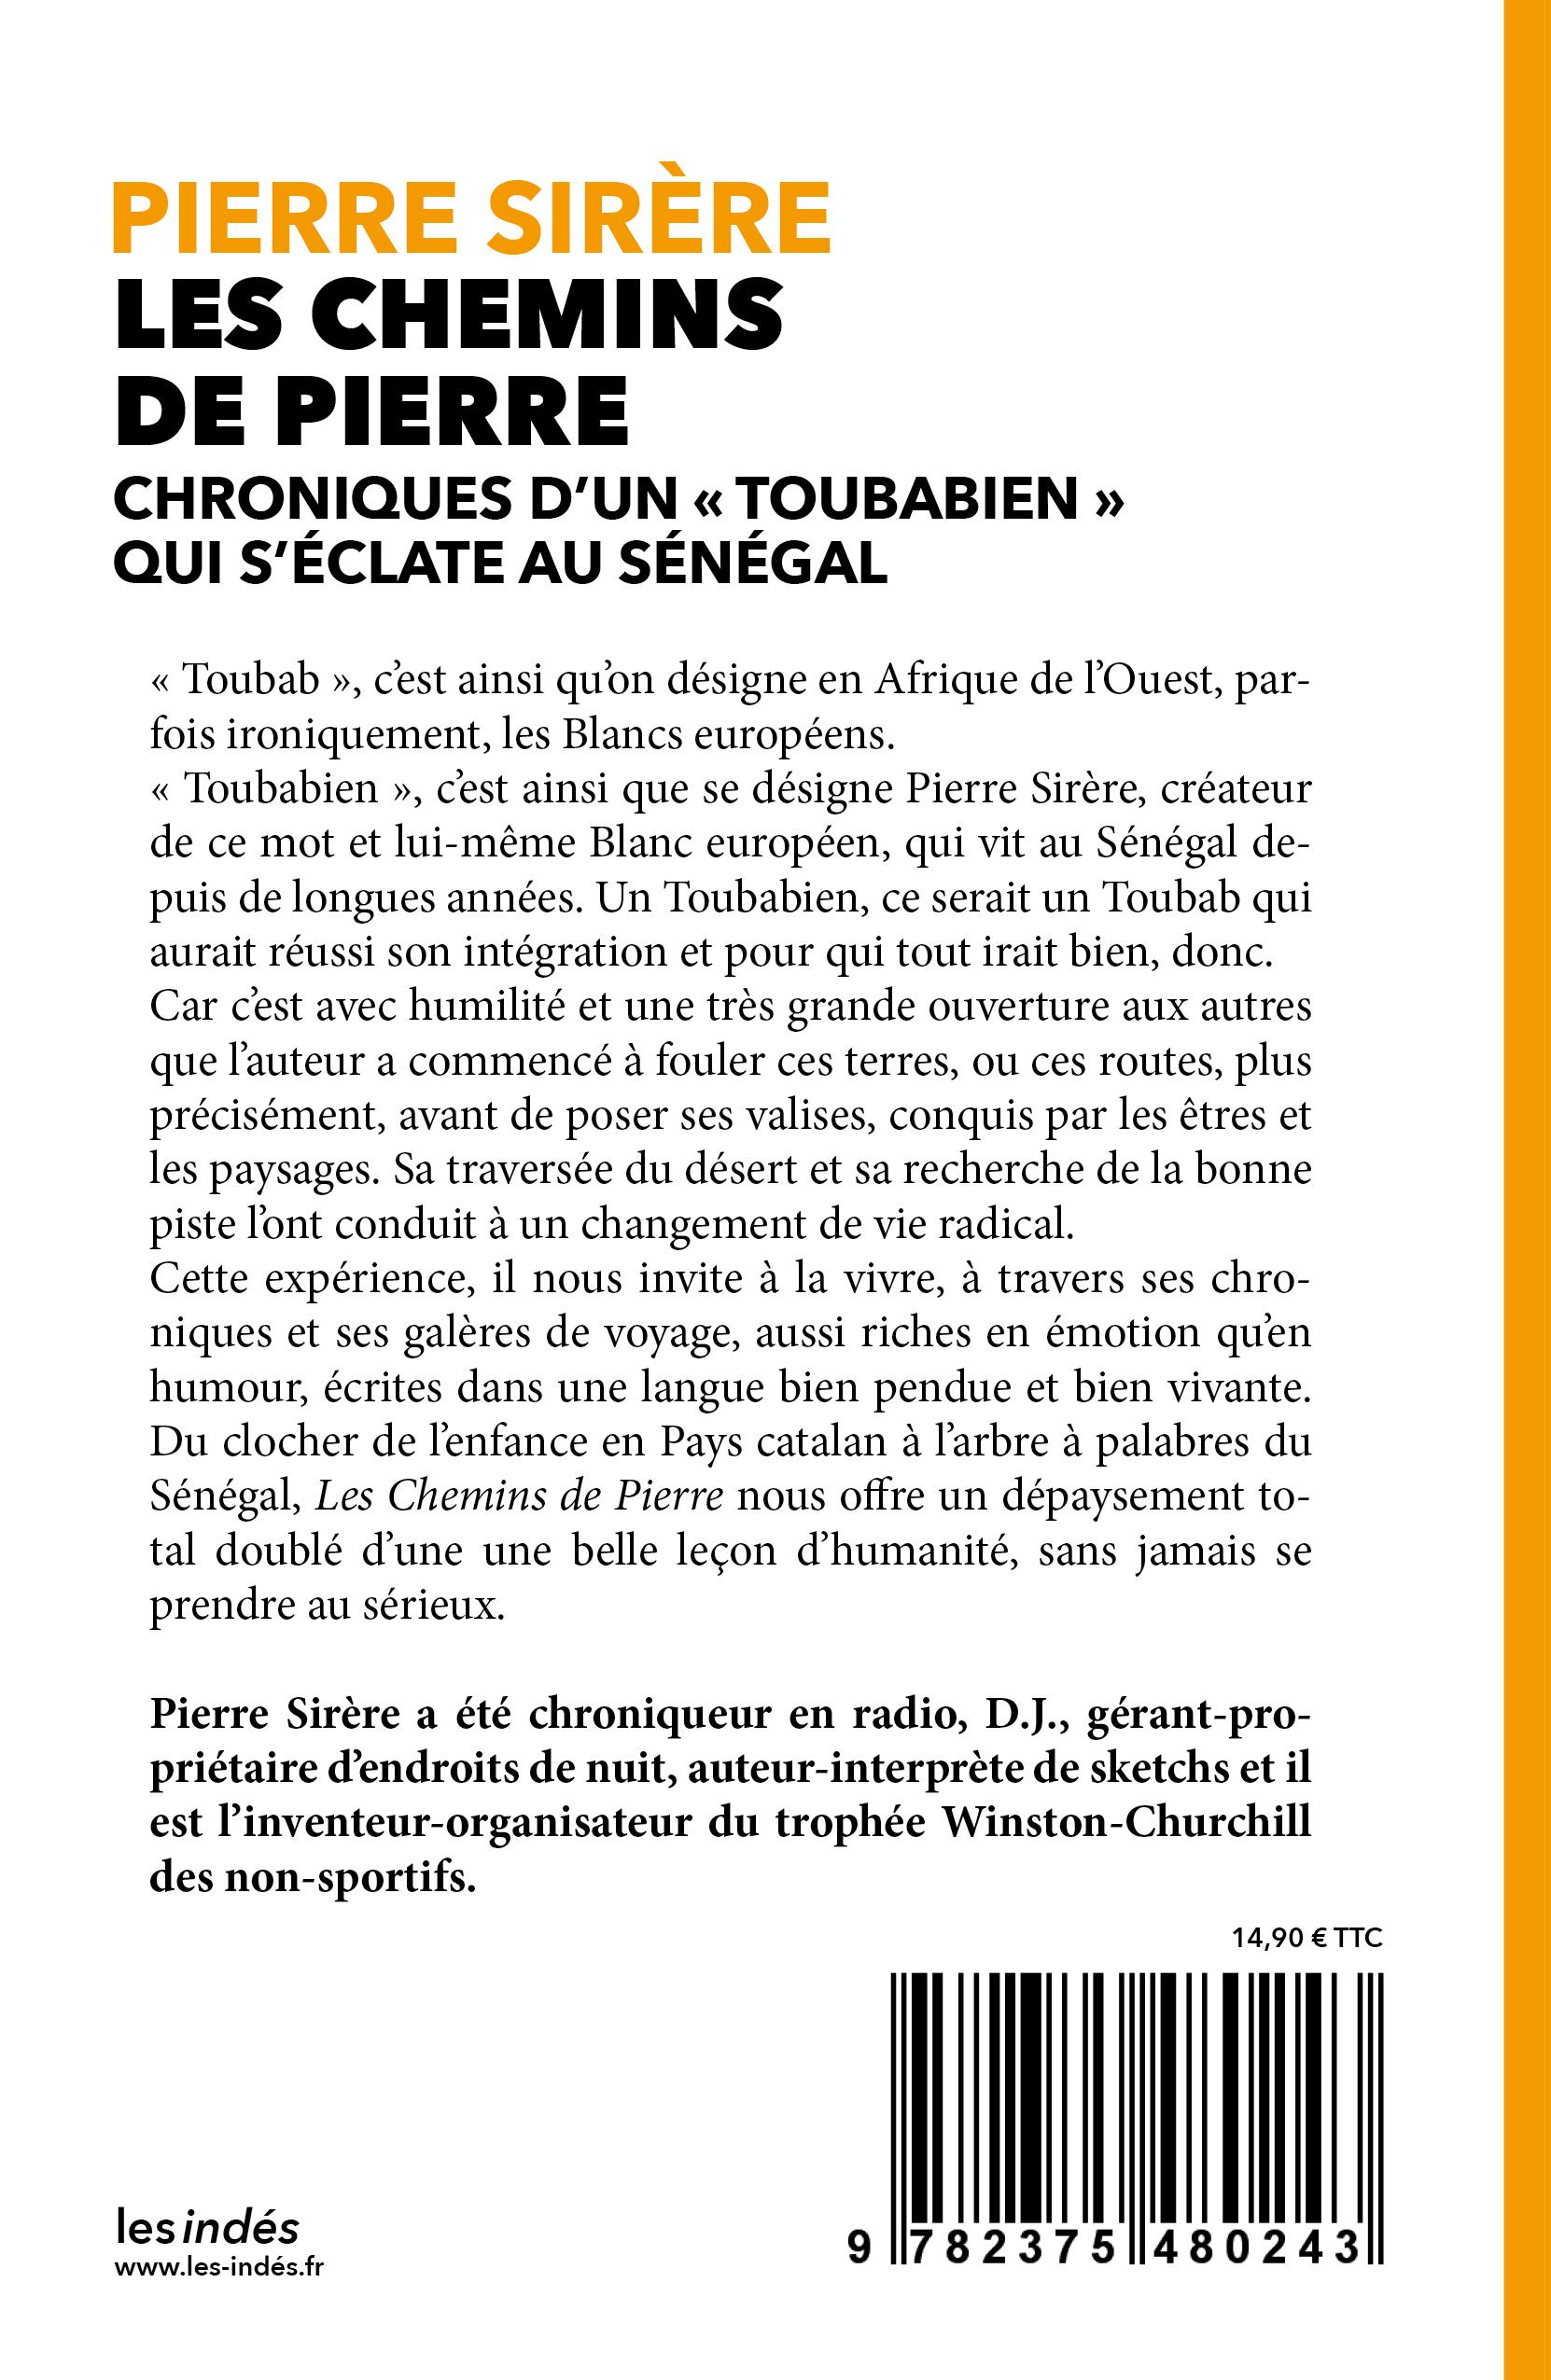 cv4_chemins_pierre